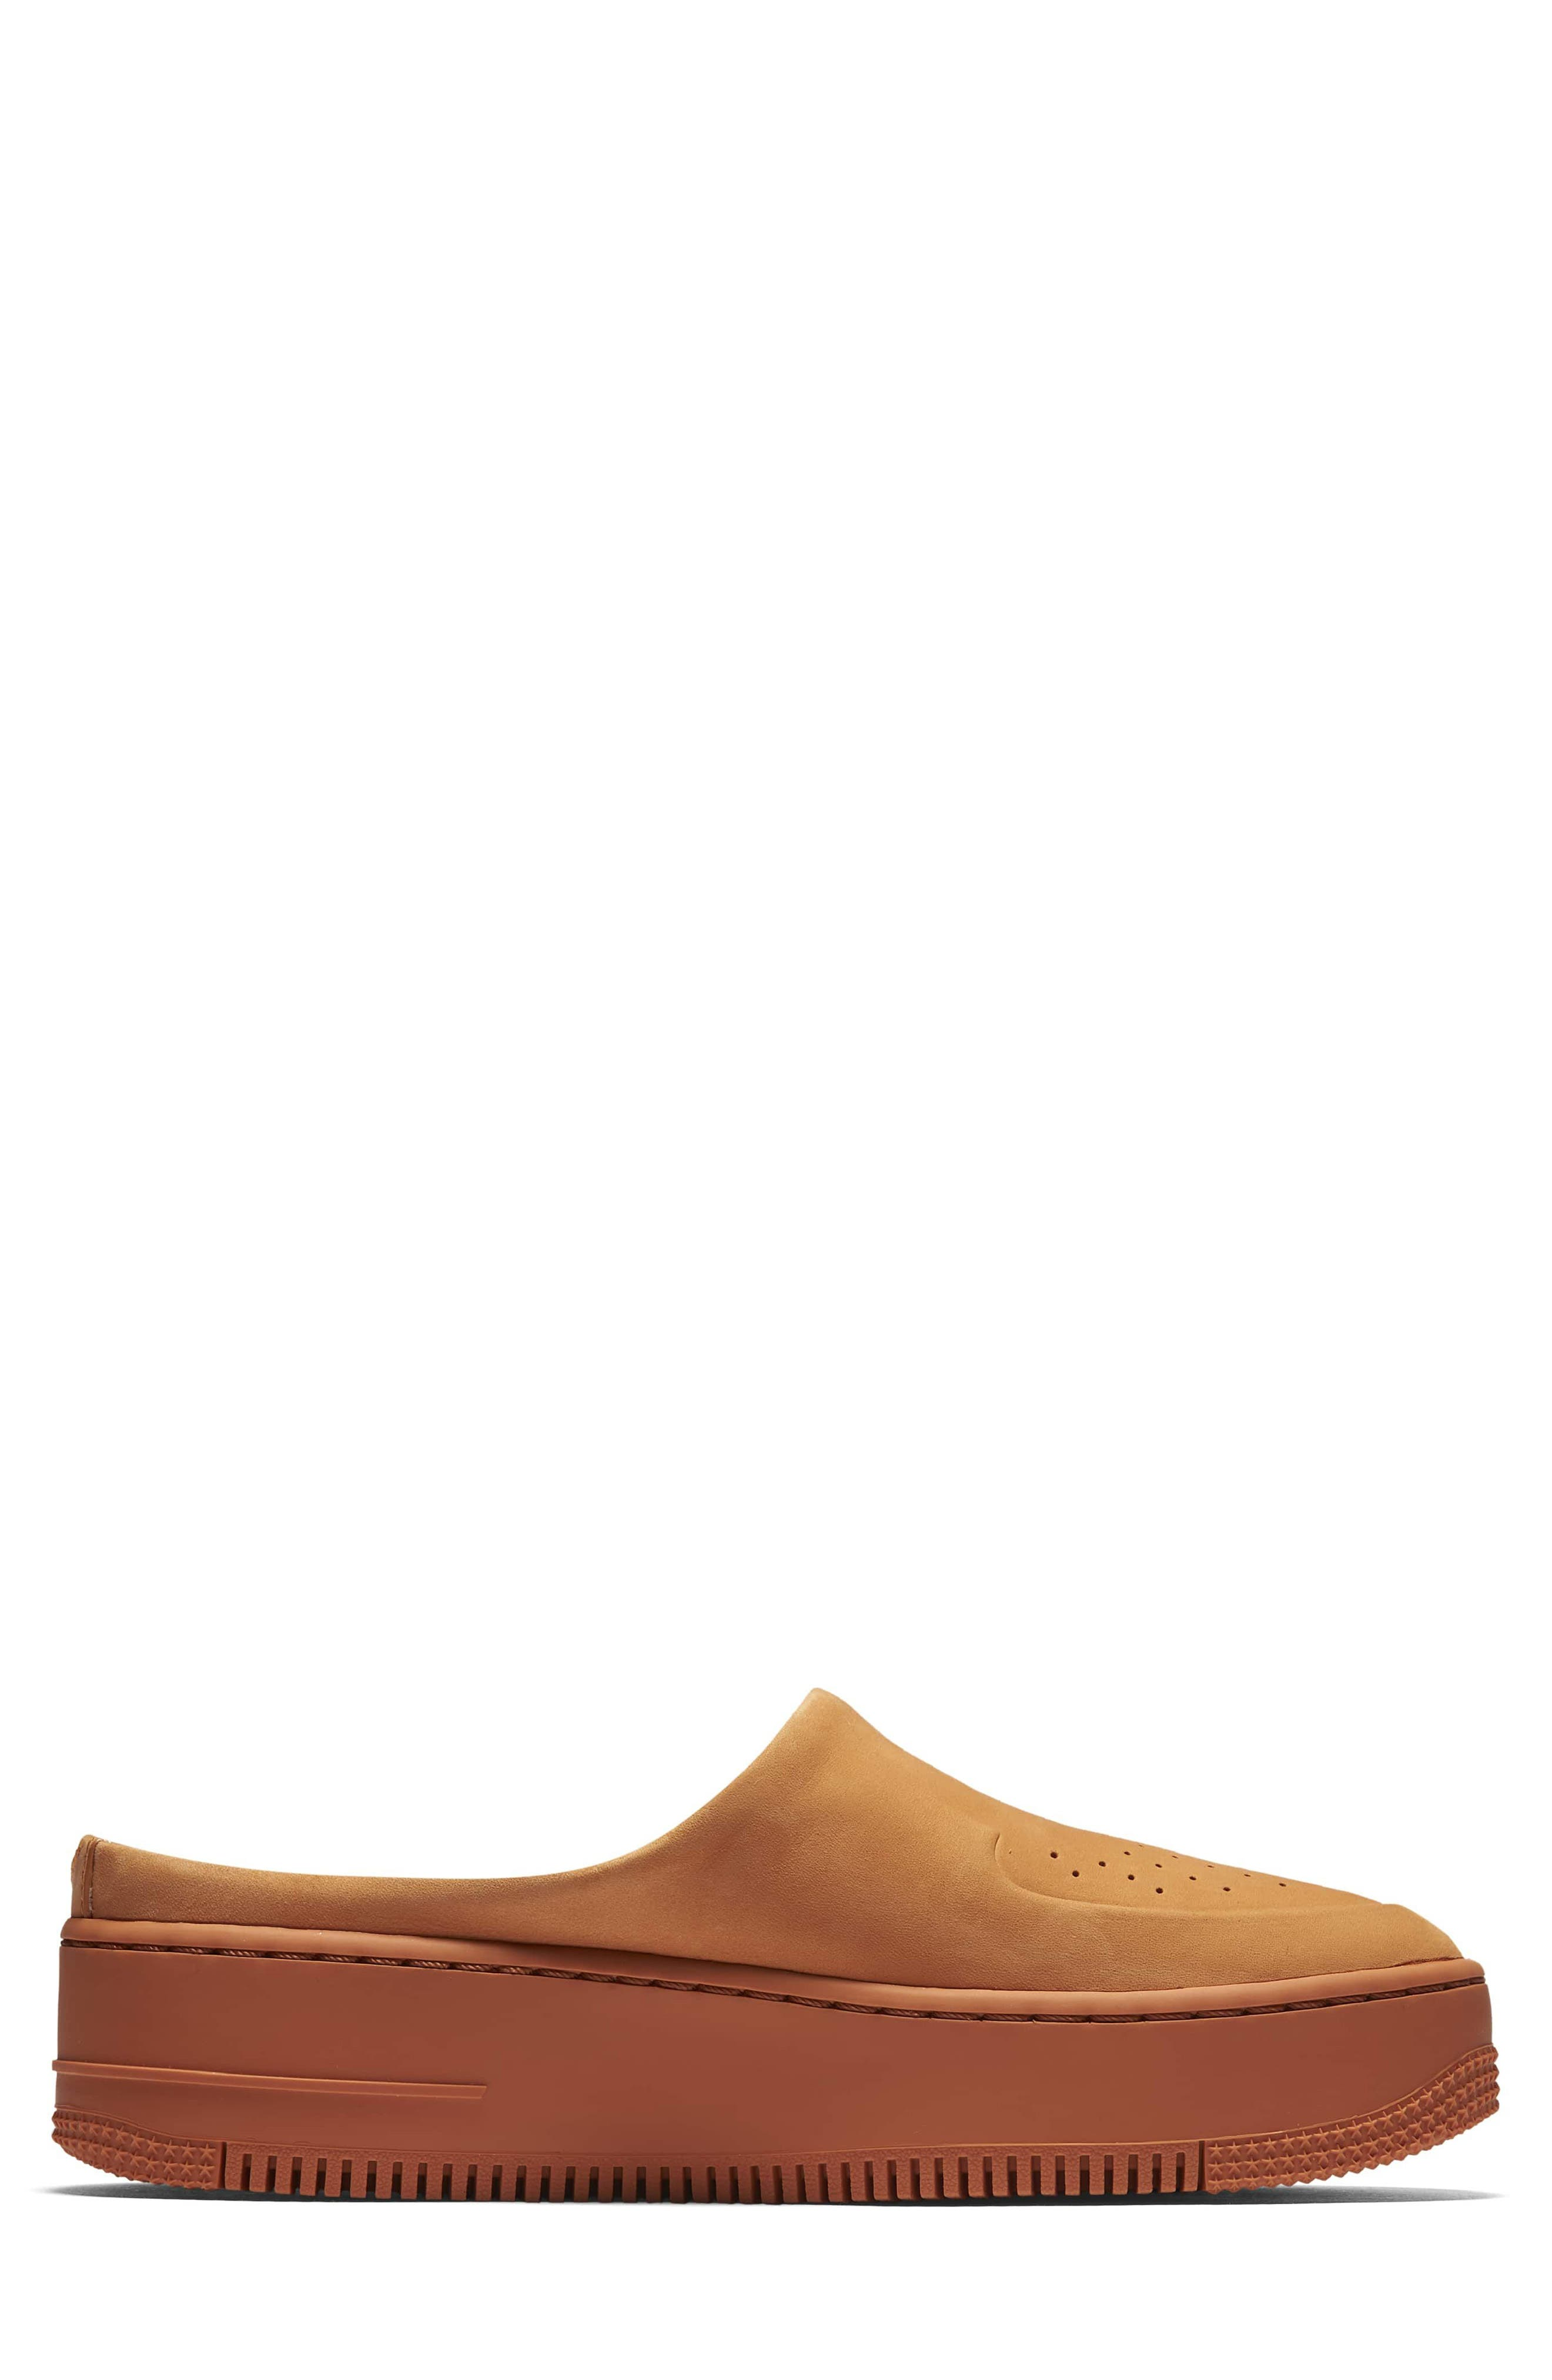 Air Force 1 Lover XX Slip-On Mule Sneaker,                             Alternate thumbnail 3, color,                             Cinder Orange